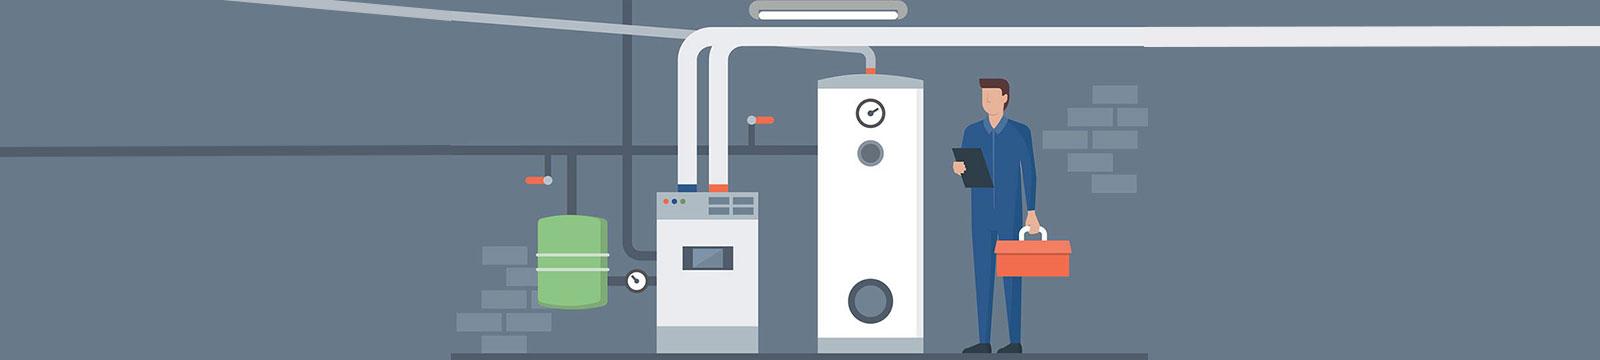 X3 Digital Marketing: Marketing for HVAC, heating cooling service technician leads